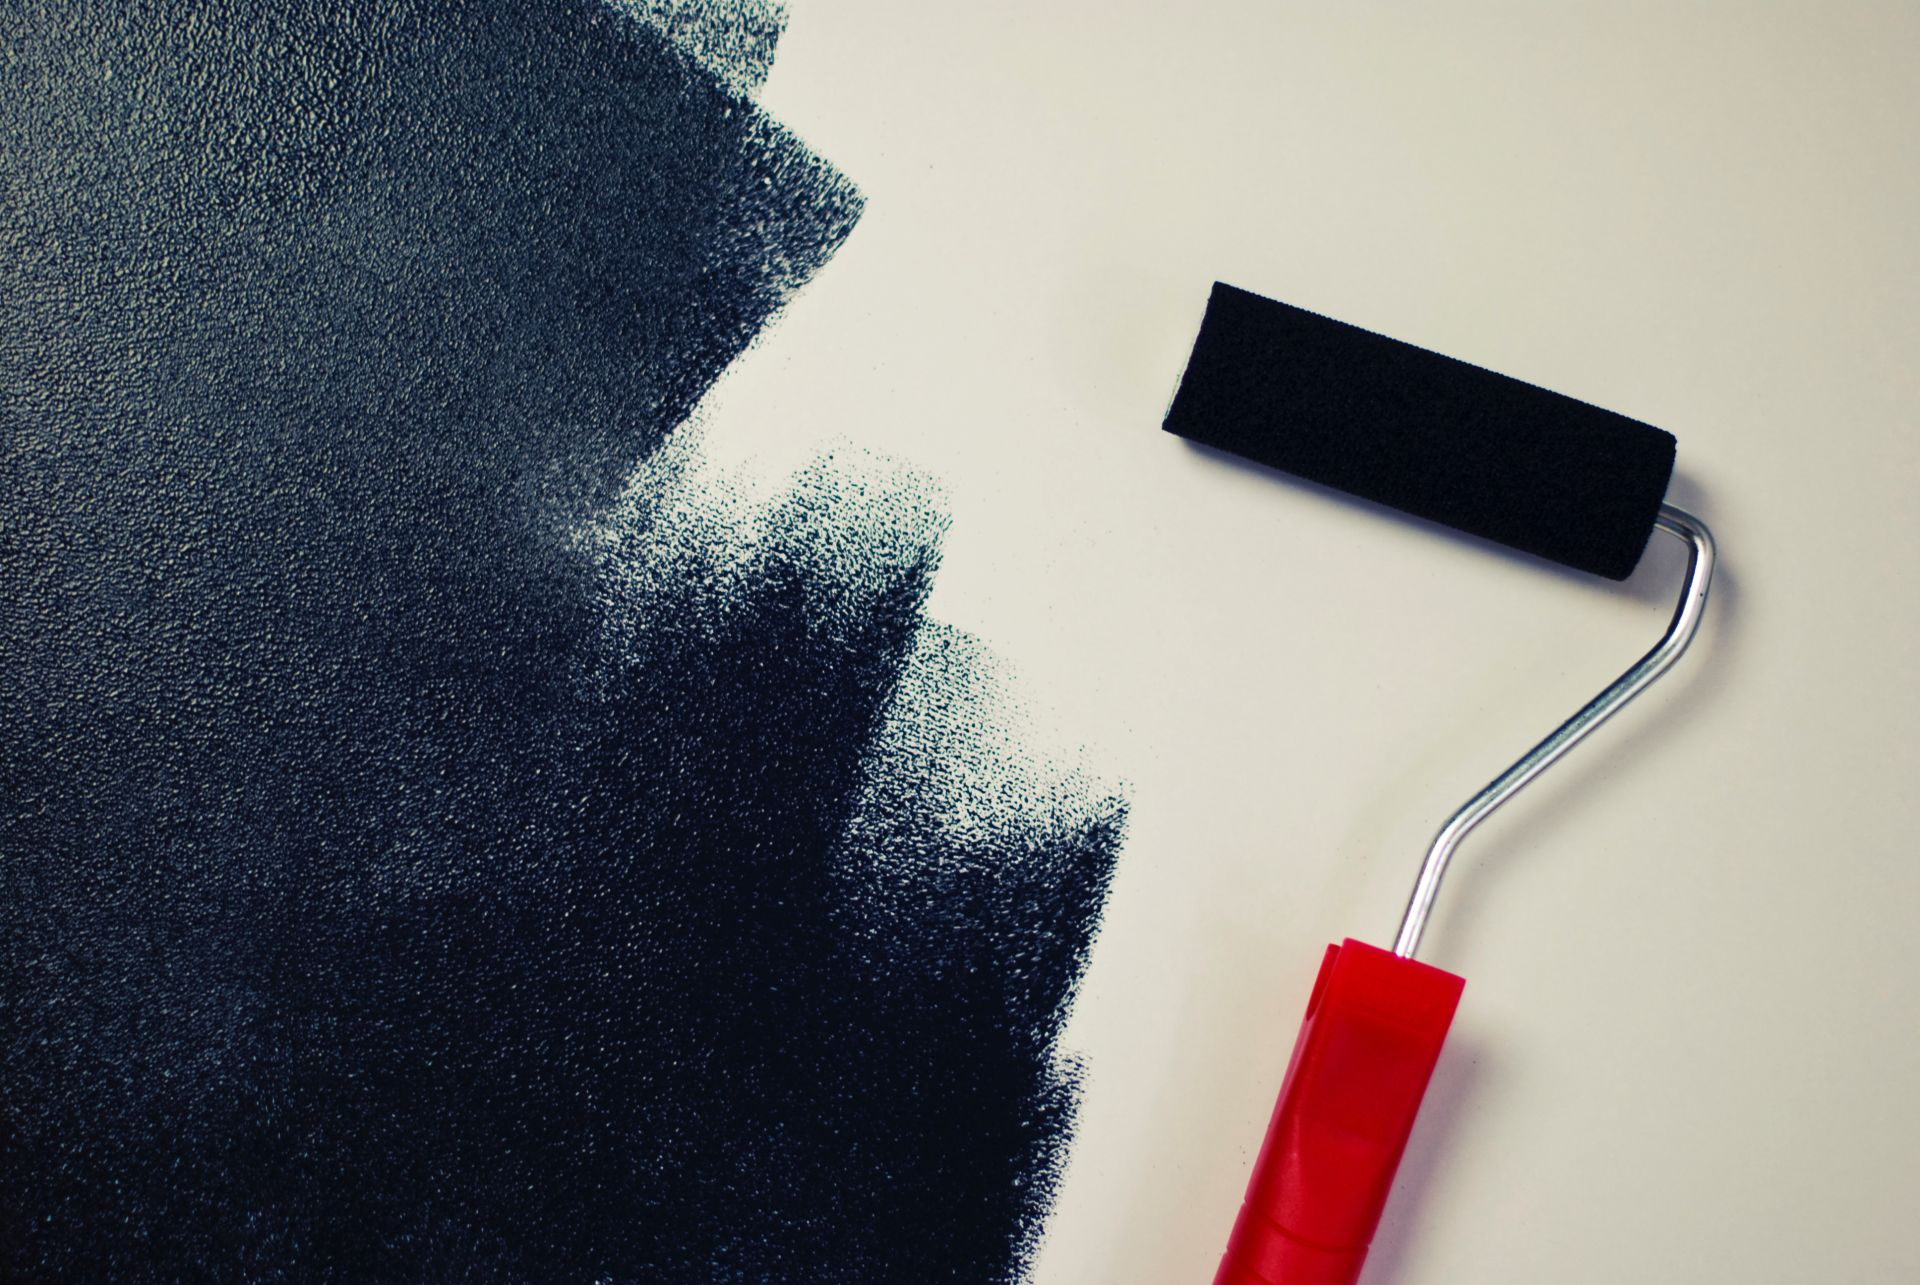 5 Better House Painting Hacks